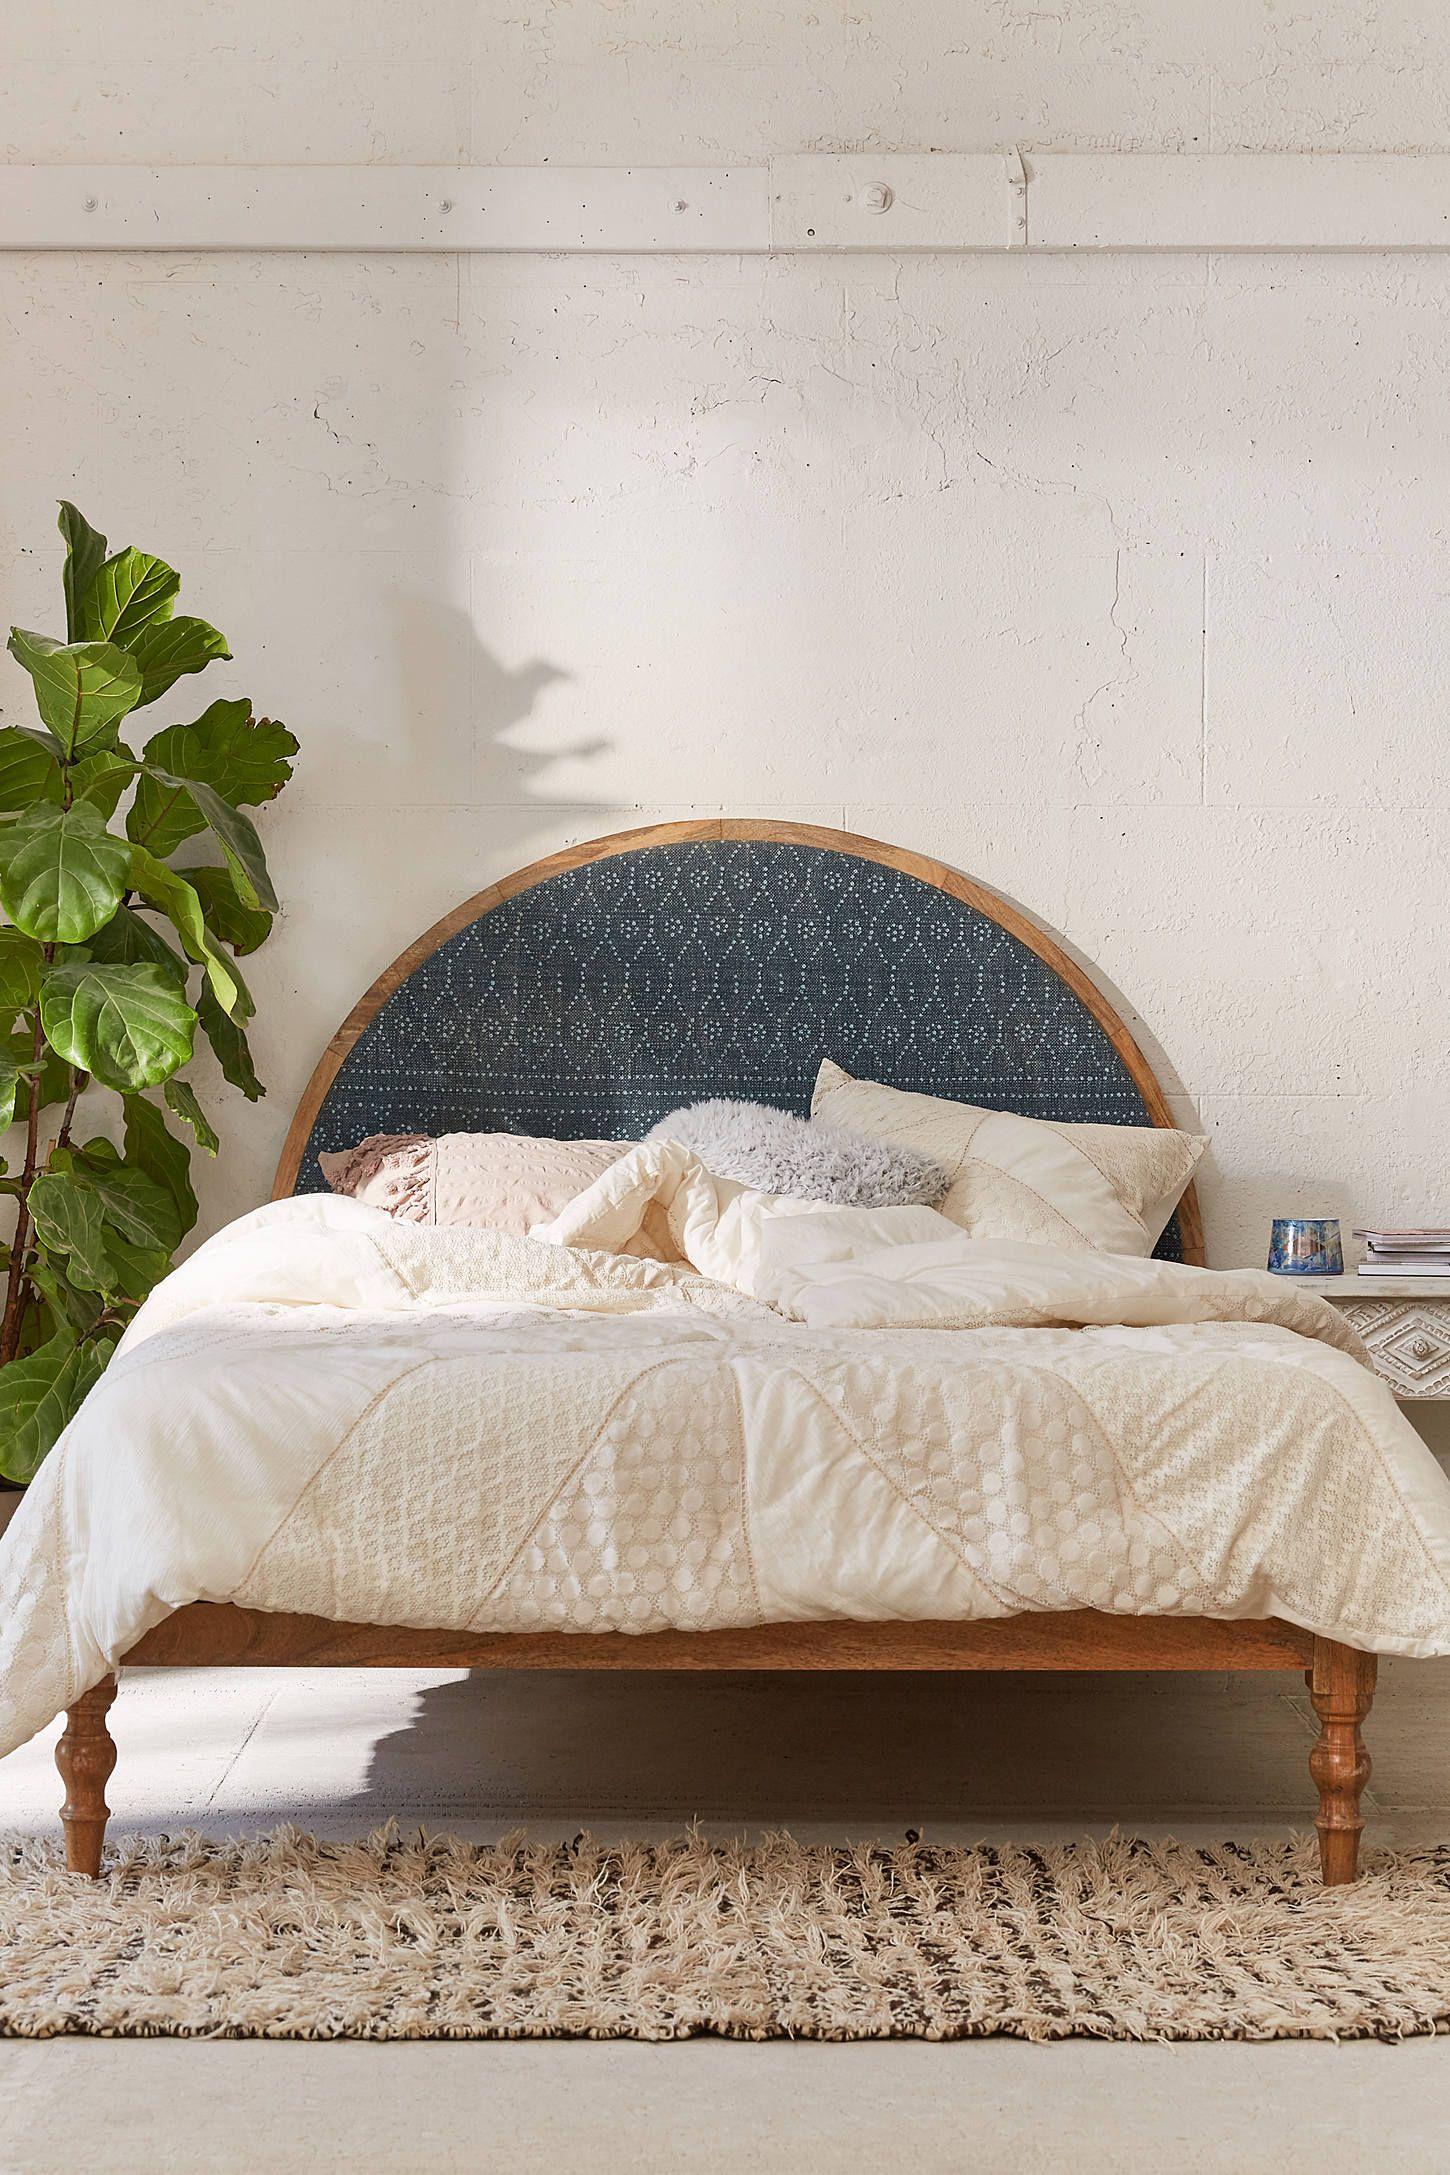 Bohemian Platform Bed Headboard Designs Headboard Decor Bed